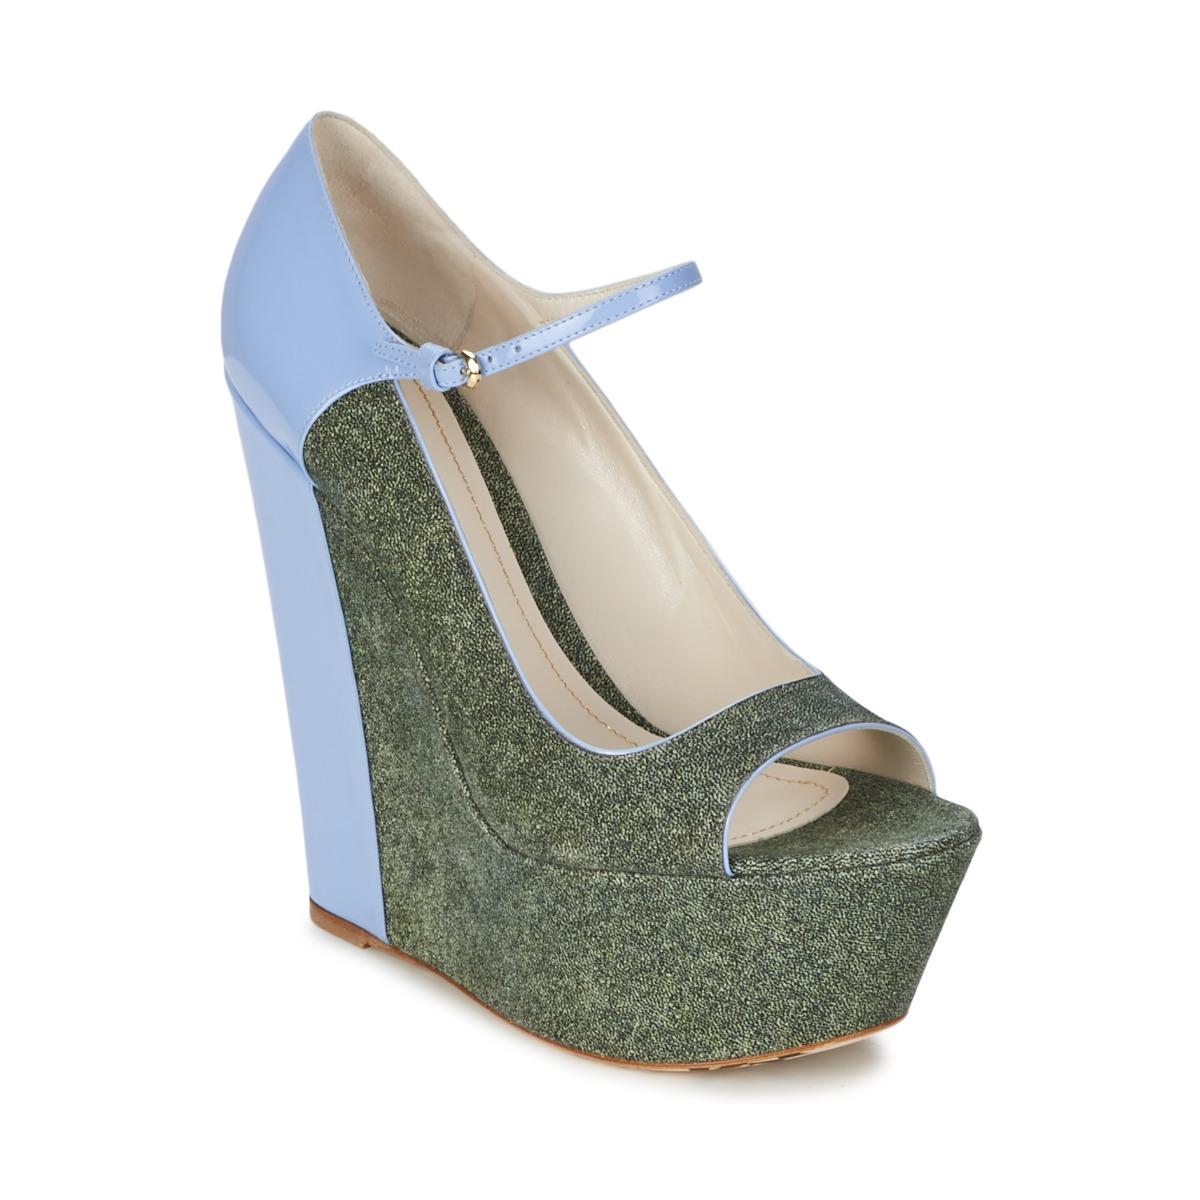 Escarpins John Galliano S54261 Bleu / Vert